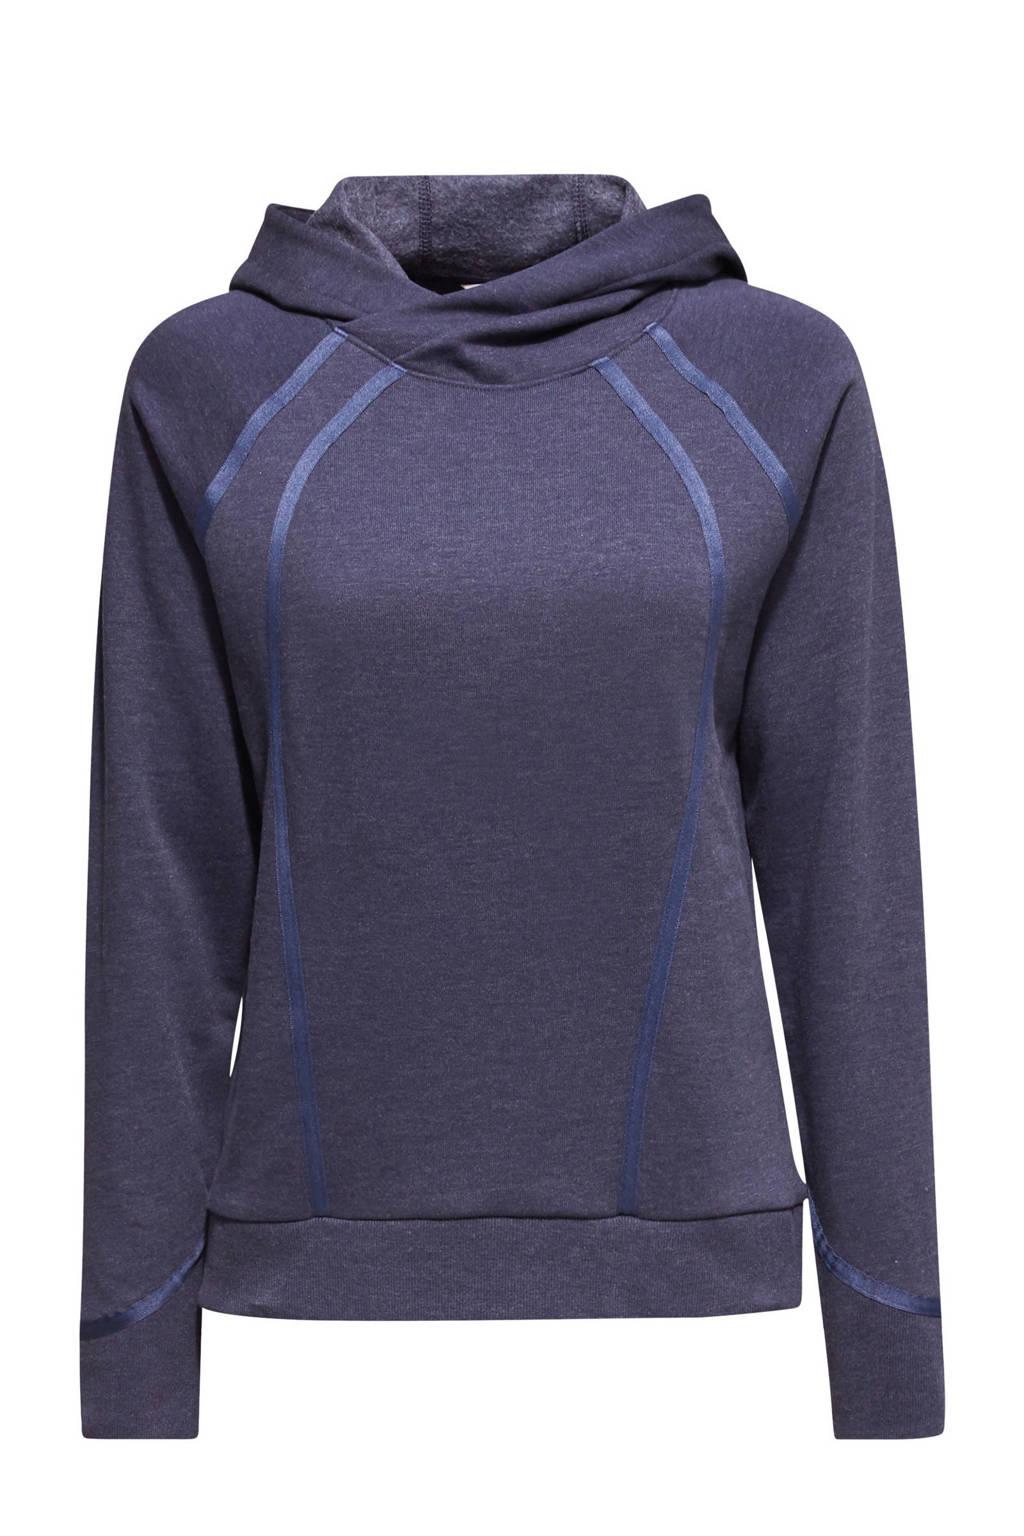 ESPRIT Women Sports sportsweater donkerblauw, Donkerblauw